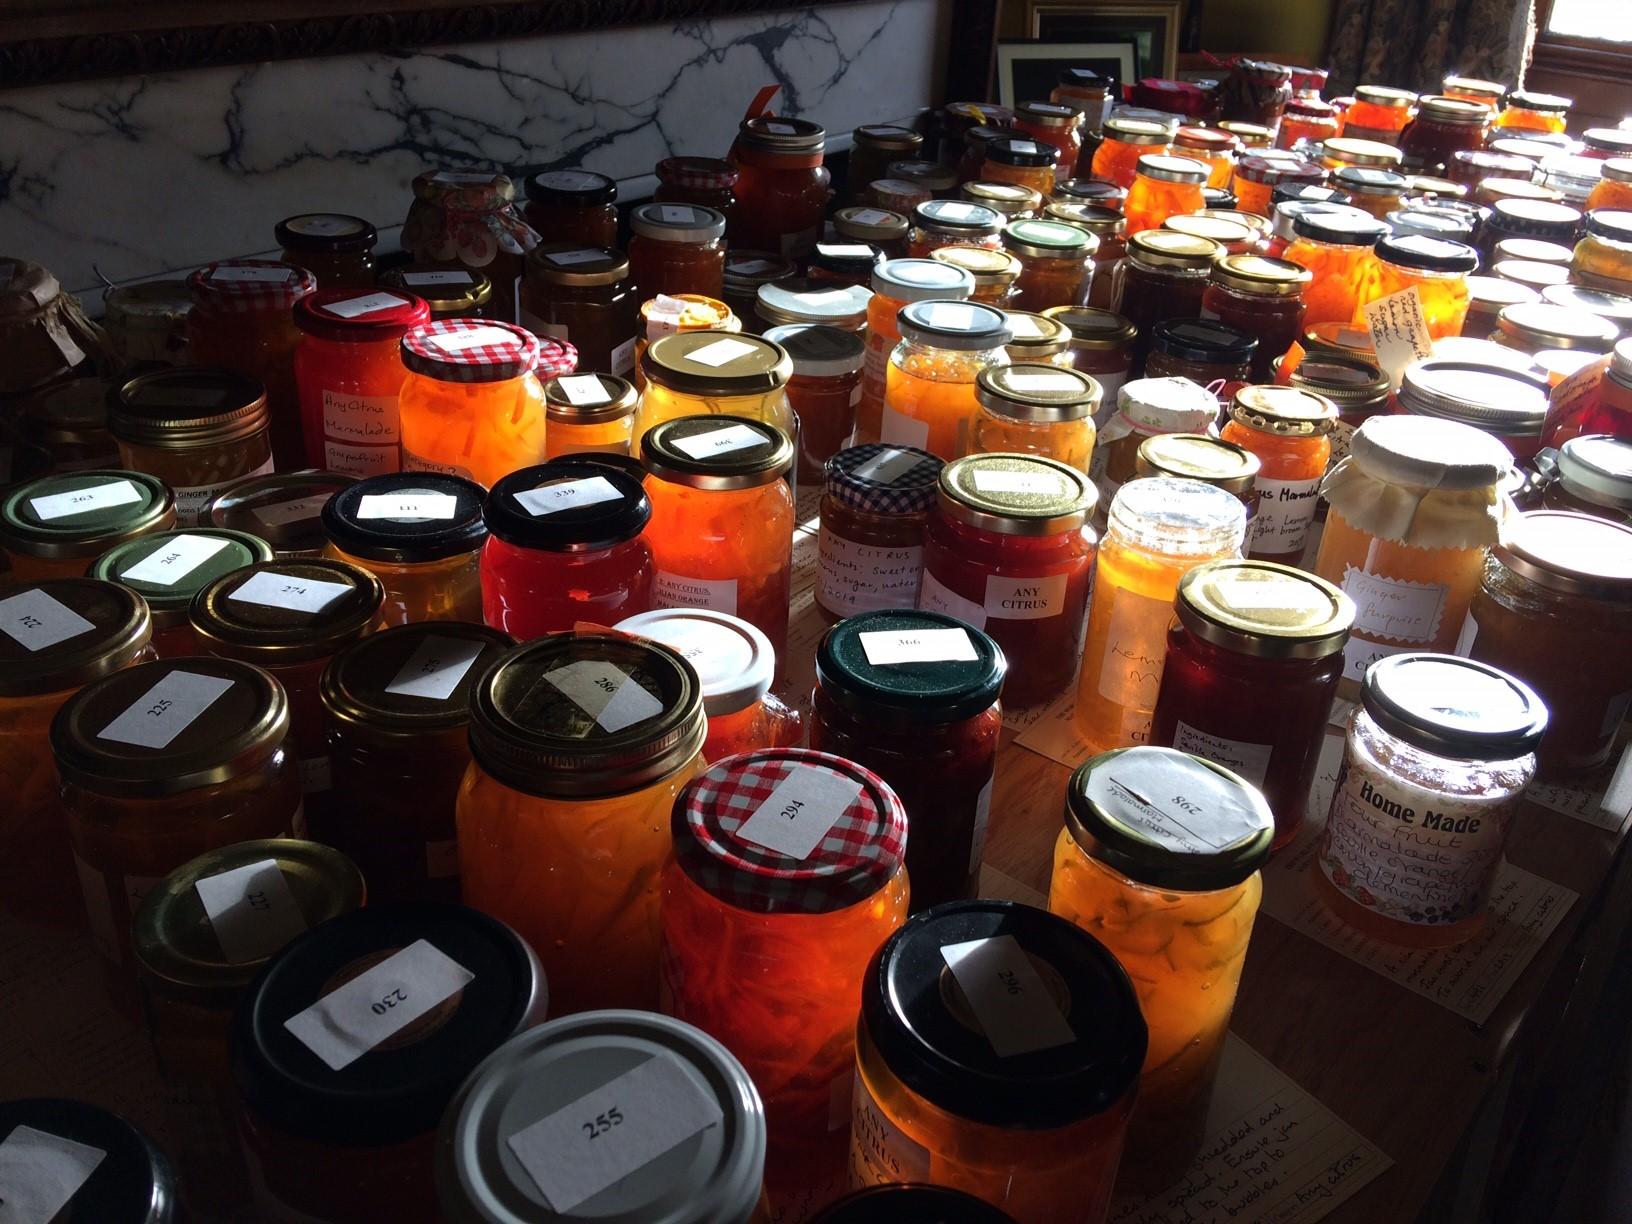 Marmalade awards show global ap-peel of this most British preserve